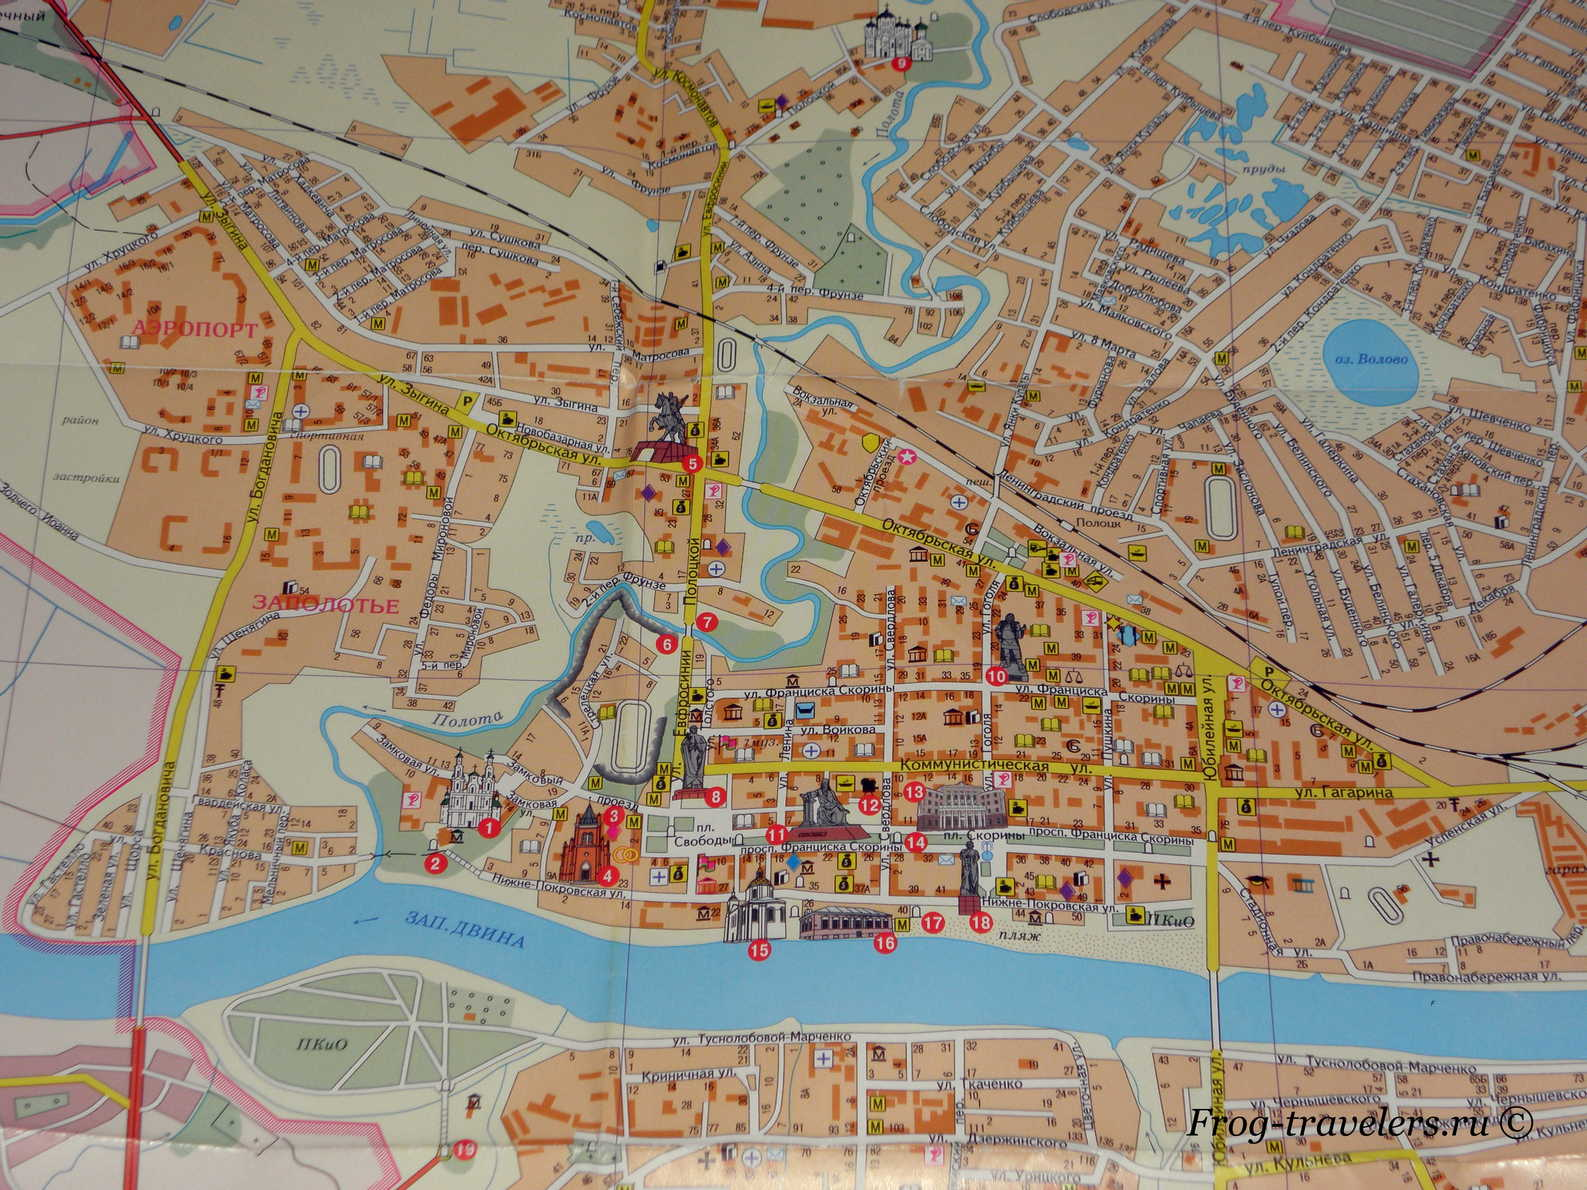 Карта Полоцка. Достопримечательности Полоцка на карте